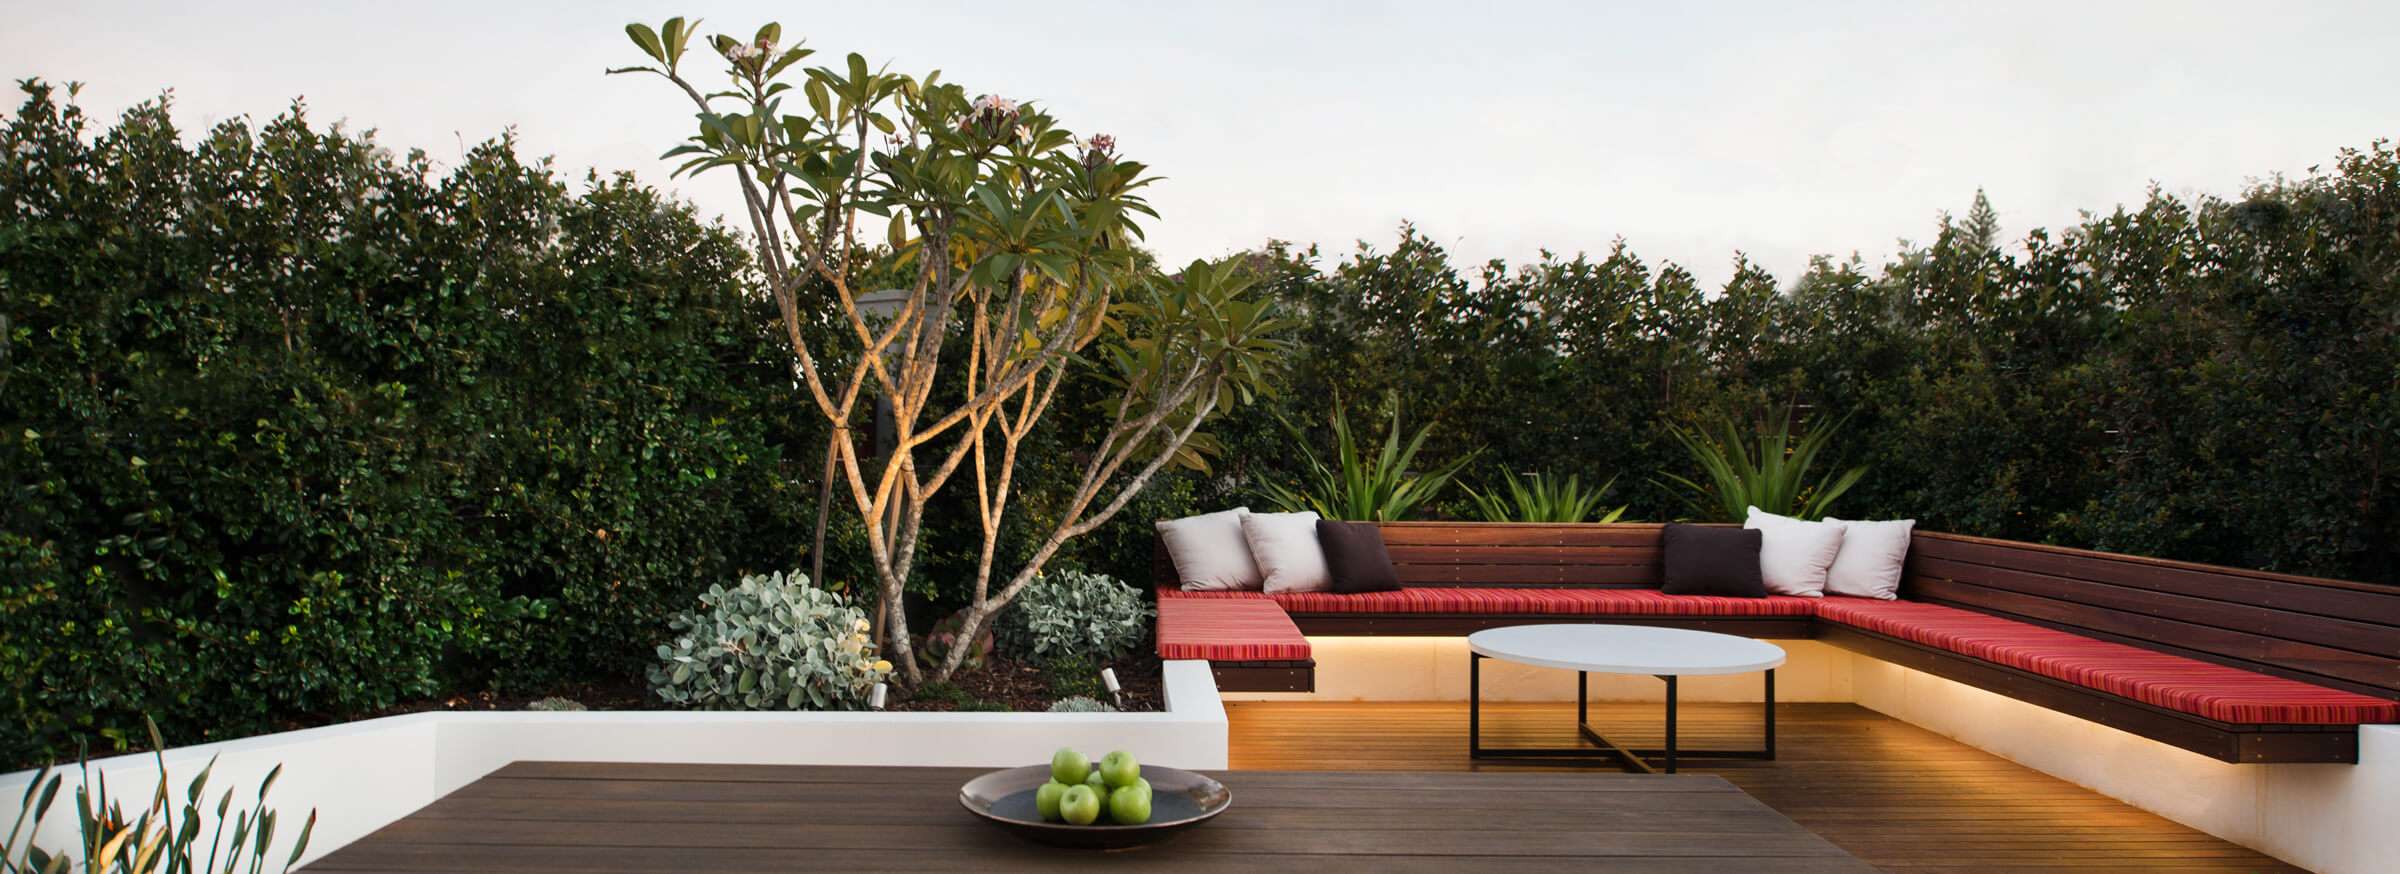 https://www.stonelotus.com.au/wp-content/uploads/2019/08/Stone-Lotus-Garden-Designer-Sydney.jpg